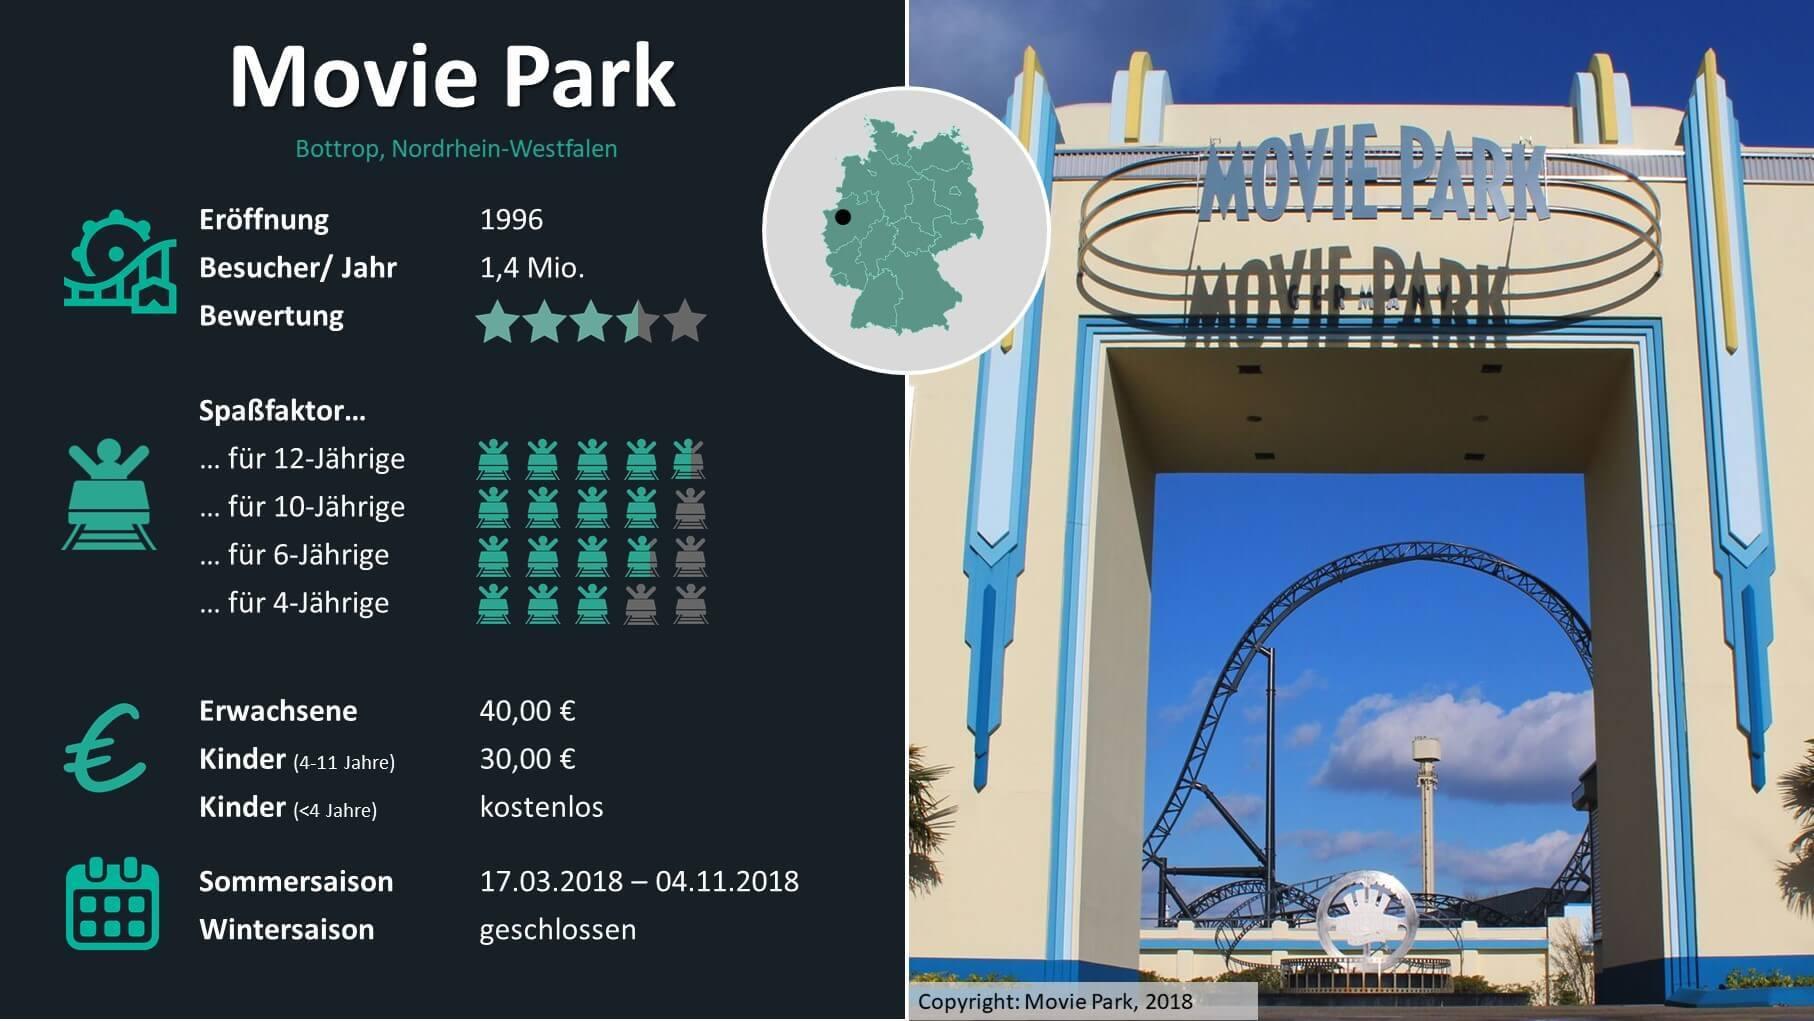 Freizeitpark Check: Movie Park